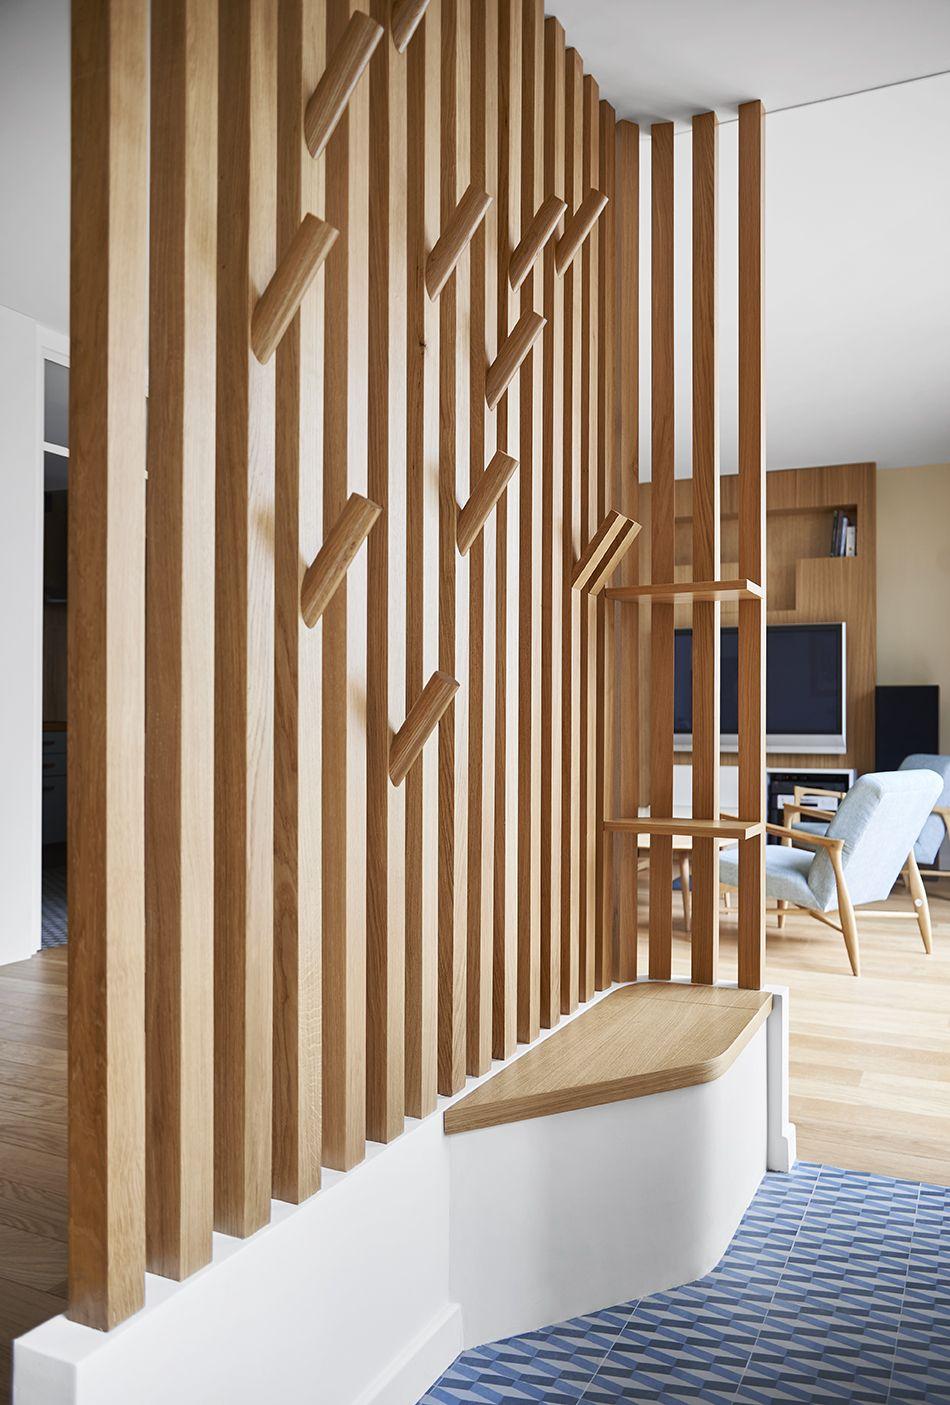 laurent l rencontre un archi home in 2019 pinterest. Black Bedroom Furniture Sets. Home Design Ideas